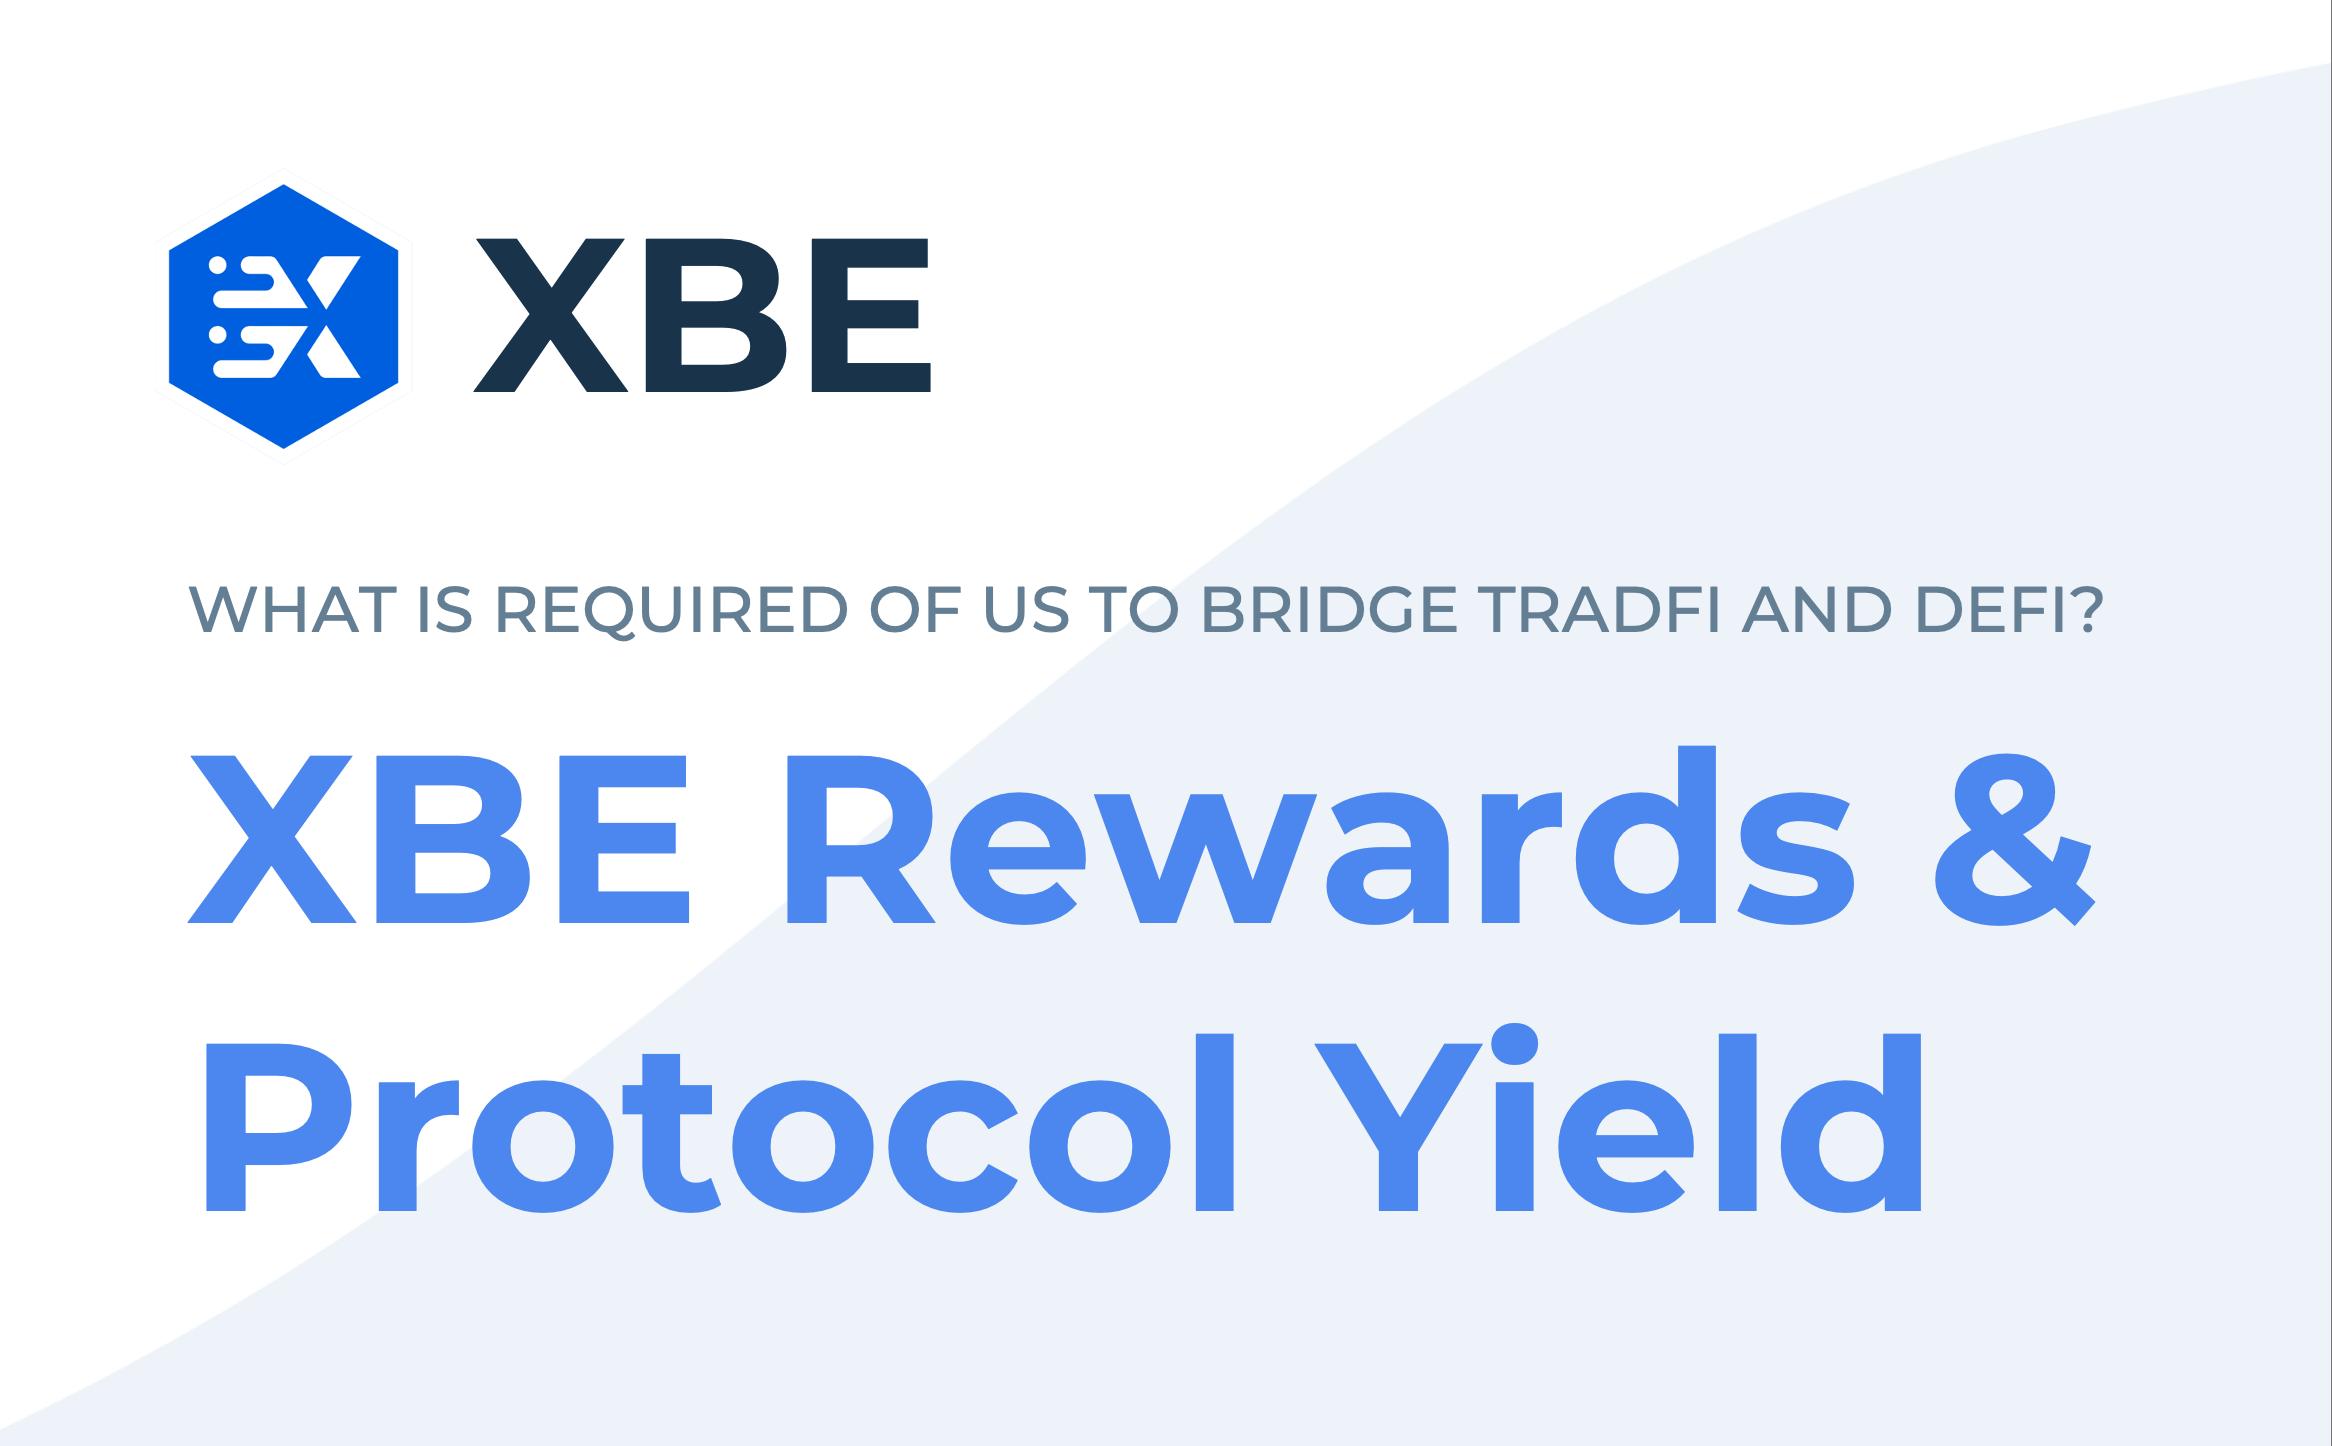 XBE Rewards and Protocol Yield